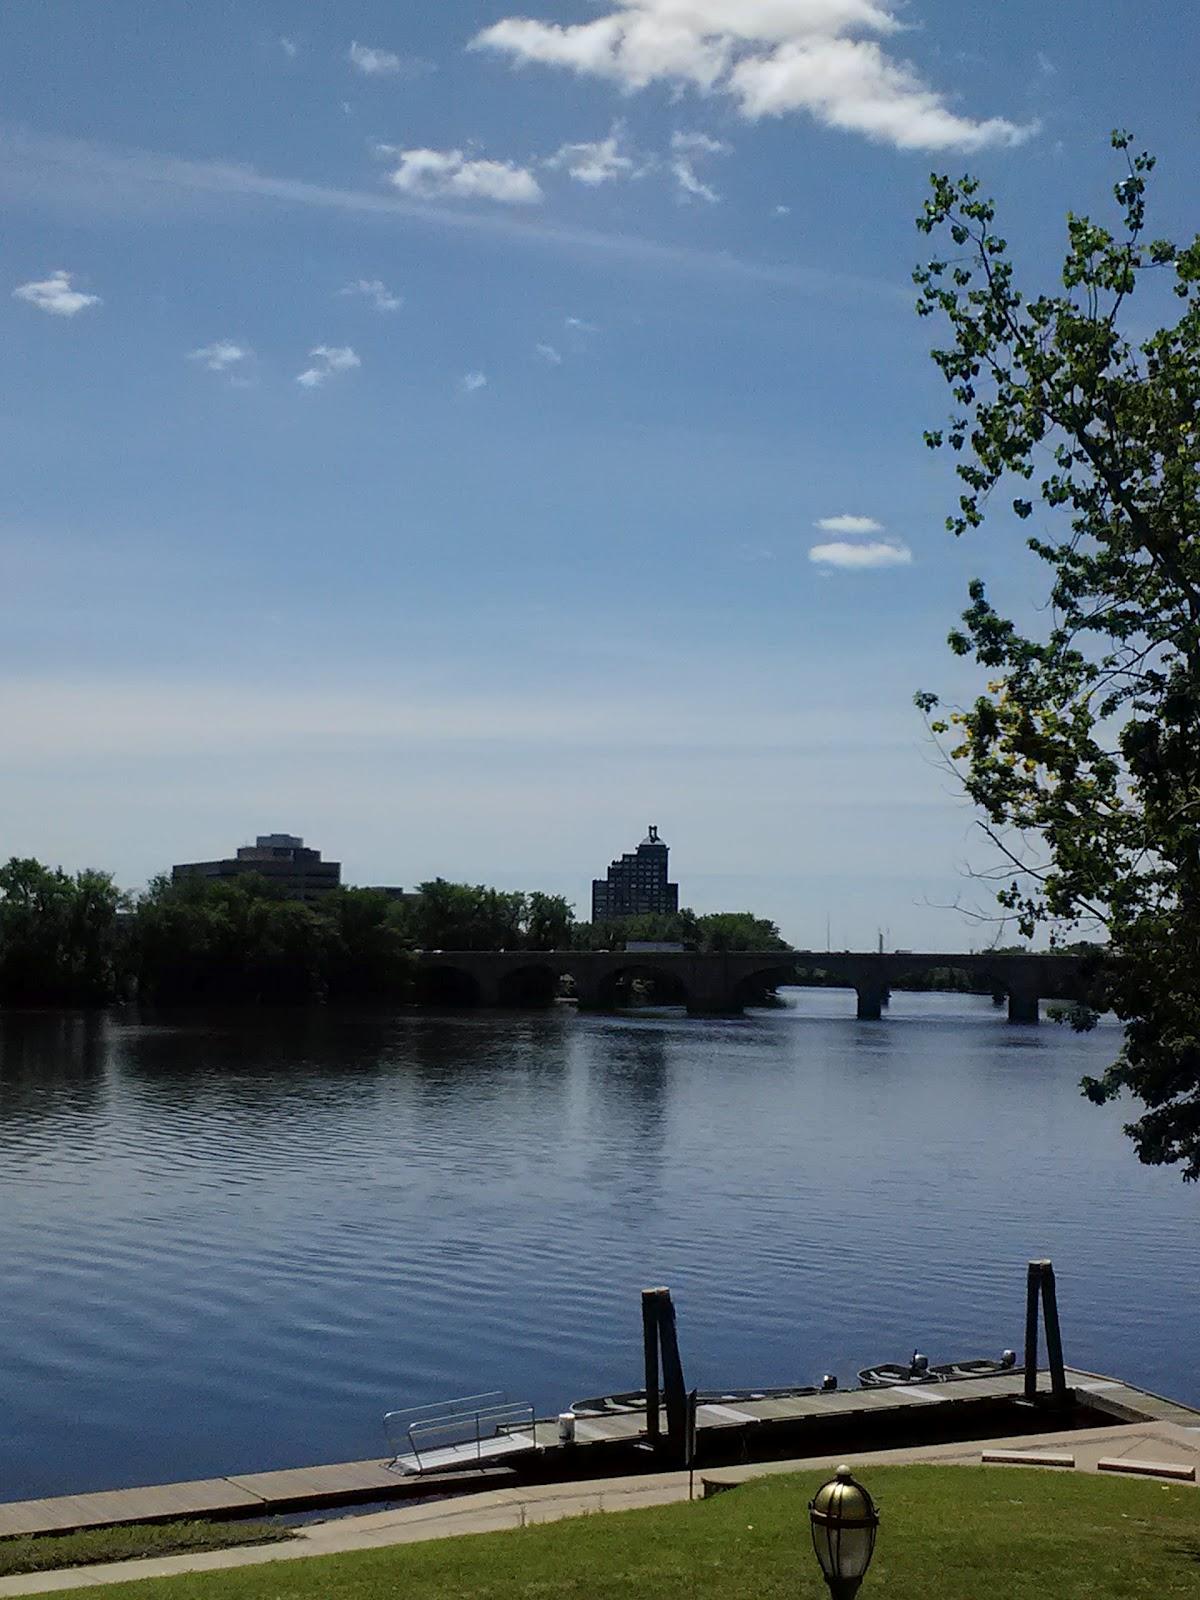 http://1.bp.blogspot.com/-vWWgtfWLFsU/T-fT1DPfQII/AAAAAAAAAMo/0gQznMQm2Ls/s1600/ct+river+waterfront+.jpg